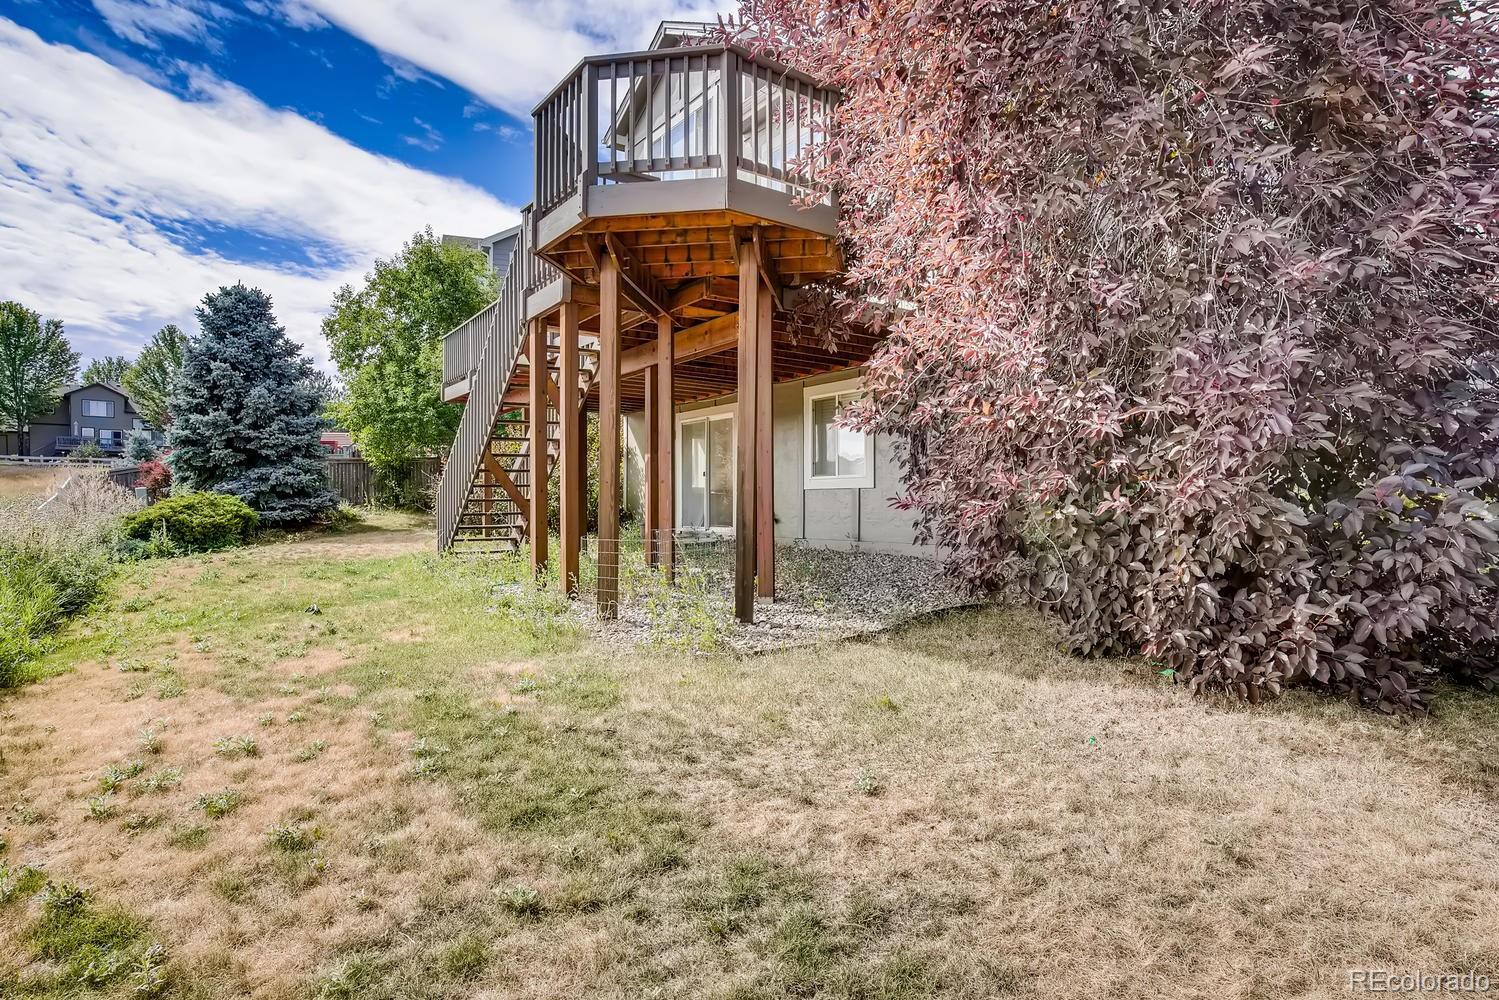 MLS# 5985663 - 27 - 387 Winterthur Way, Highlands Ranch, CO 80129